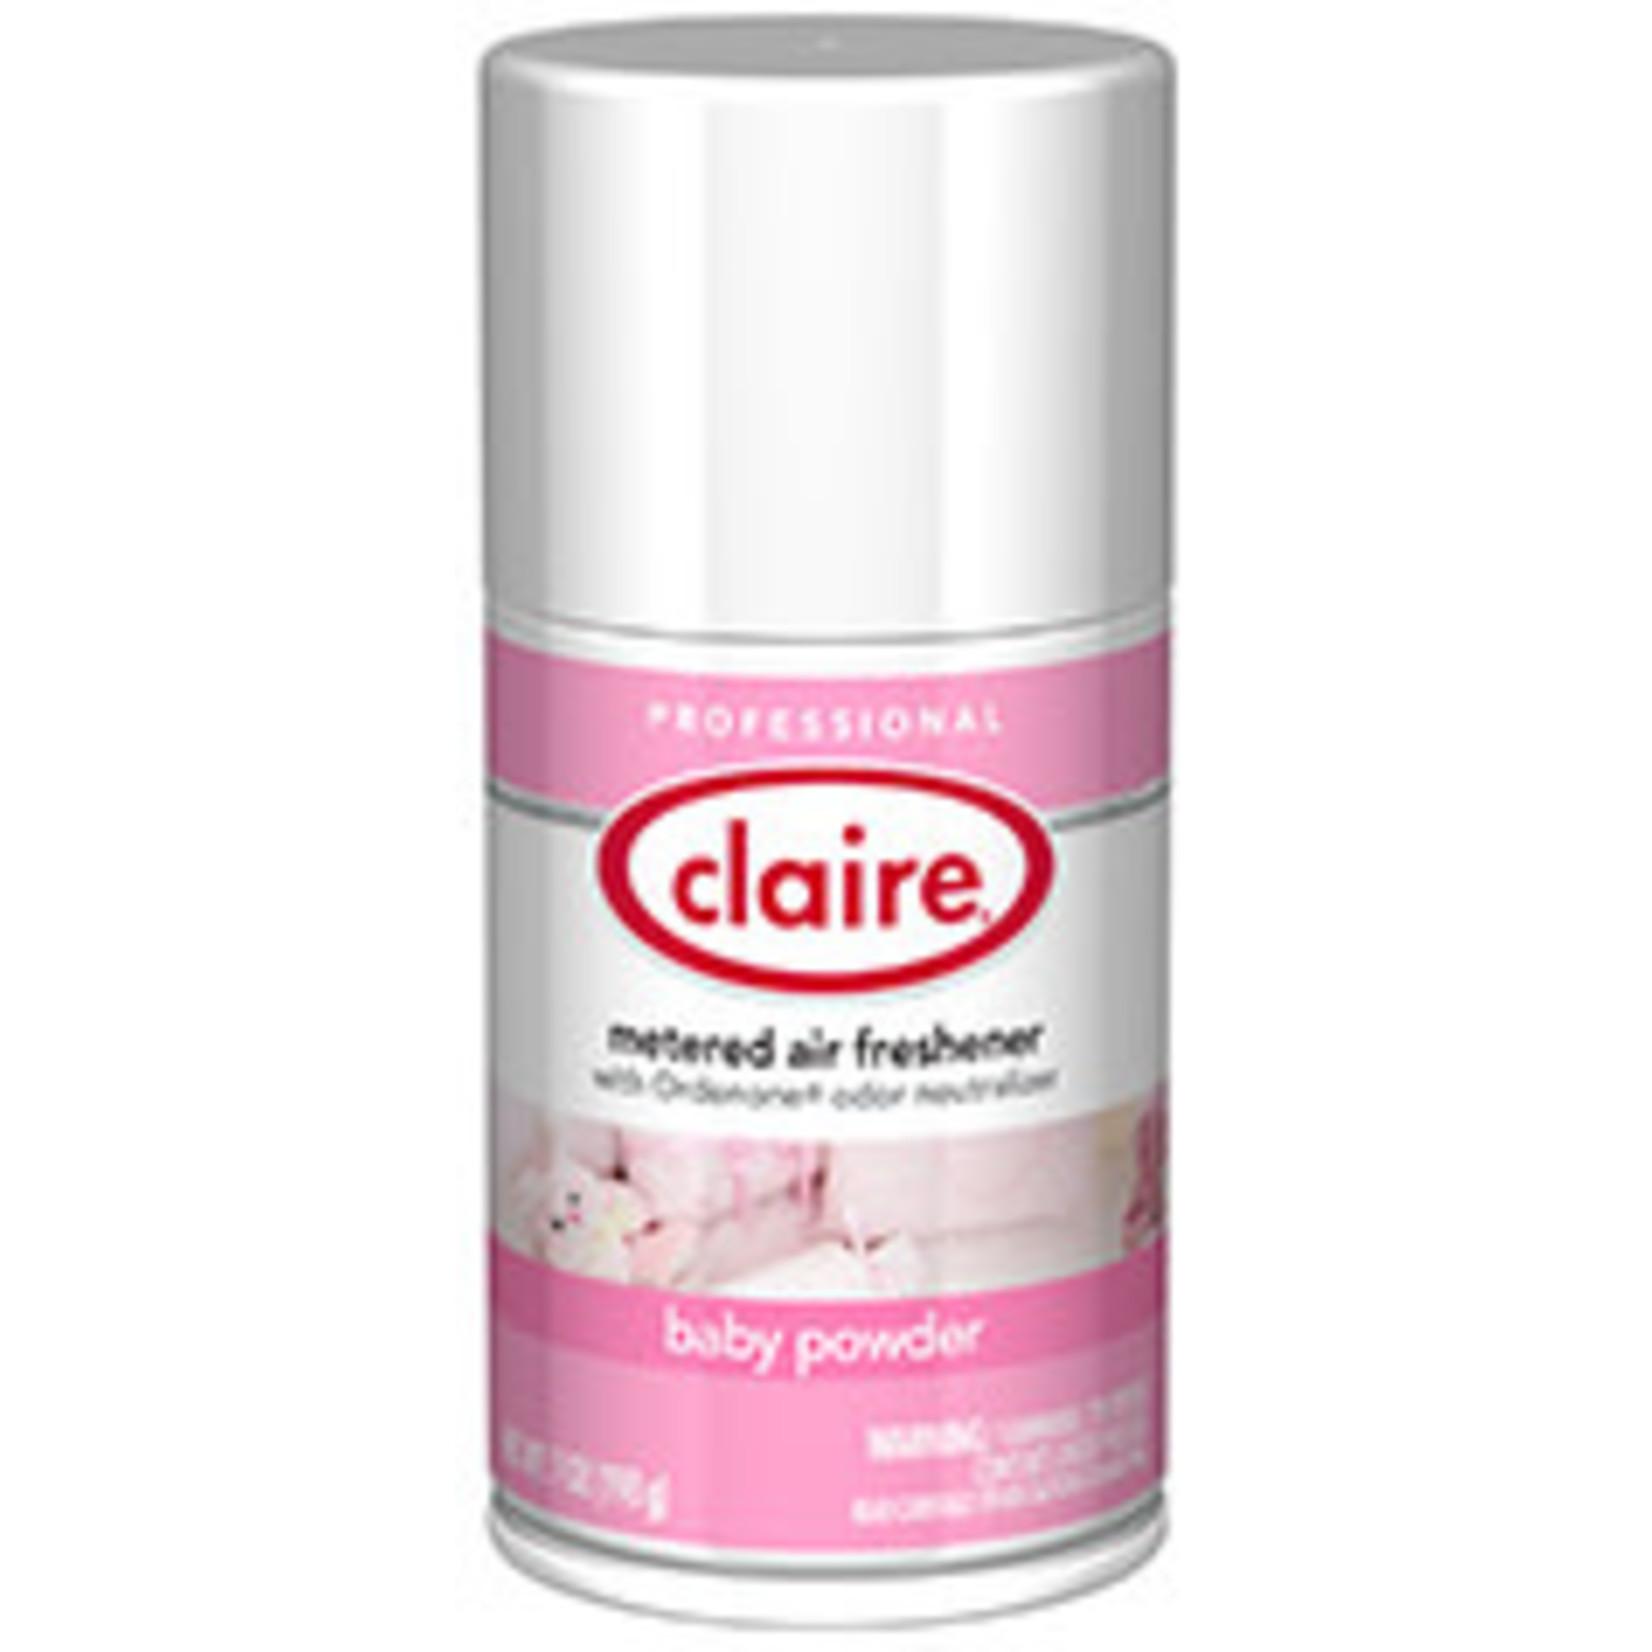 Claire Baby Powder - 7oz